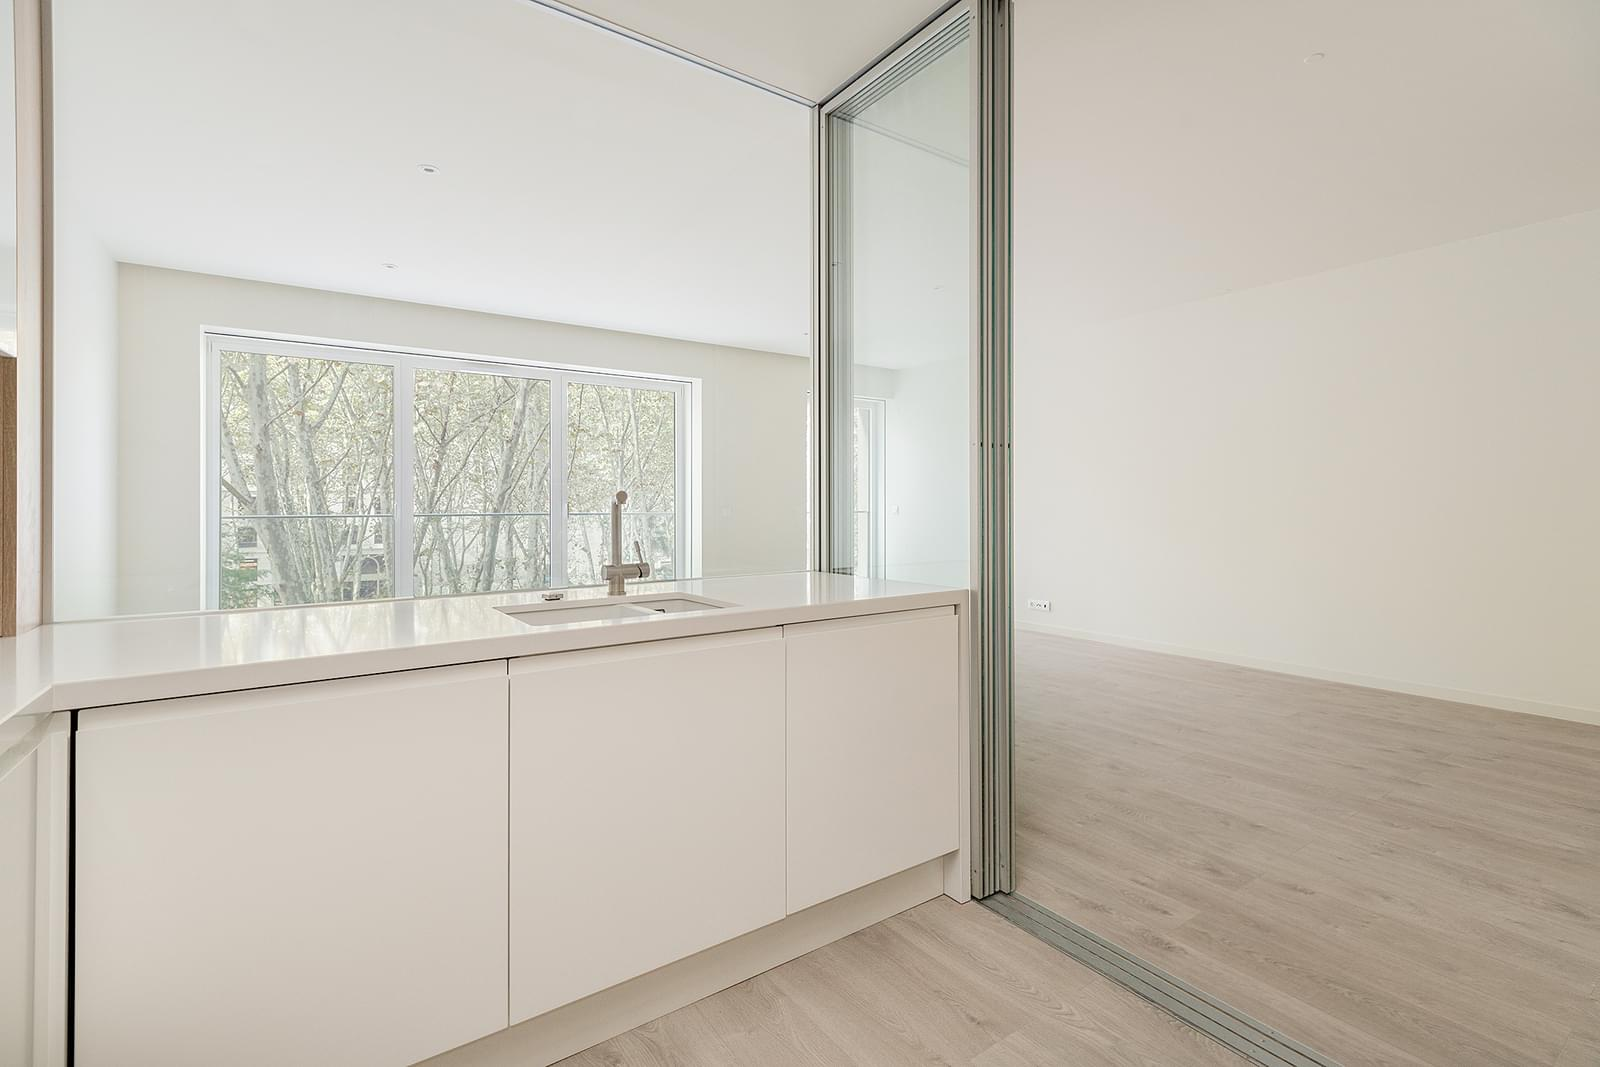 pf18308-apartamento-t2-lisboa-bc7badb1-f210-4f74-87fa-117f01a7c7b3